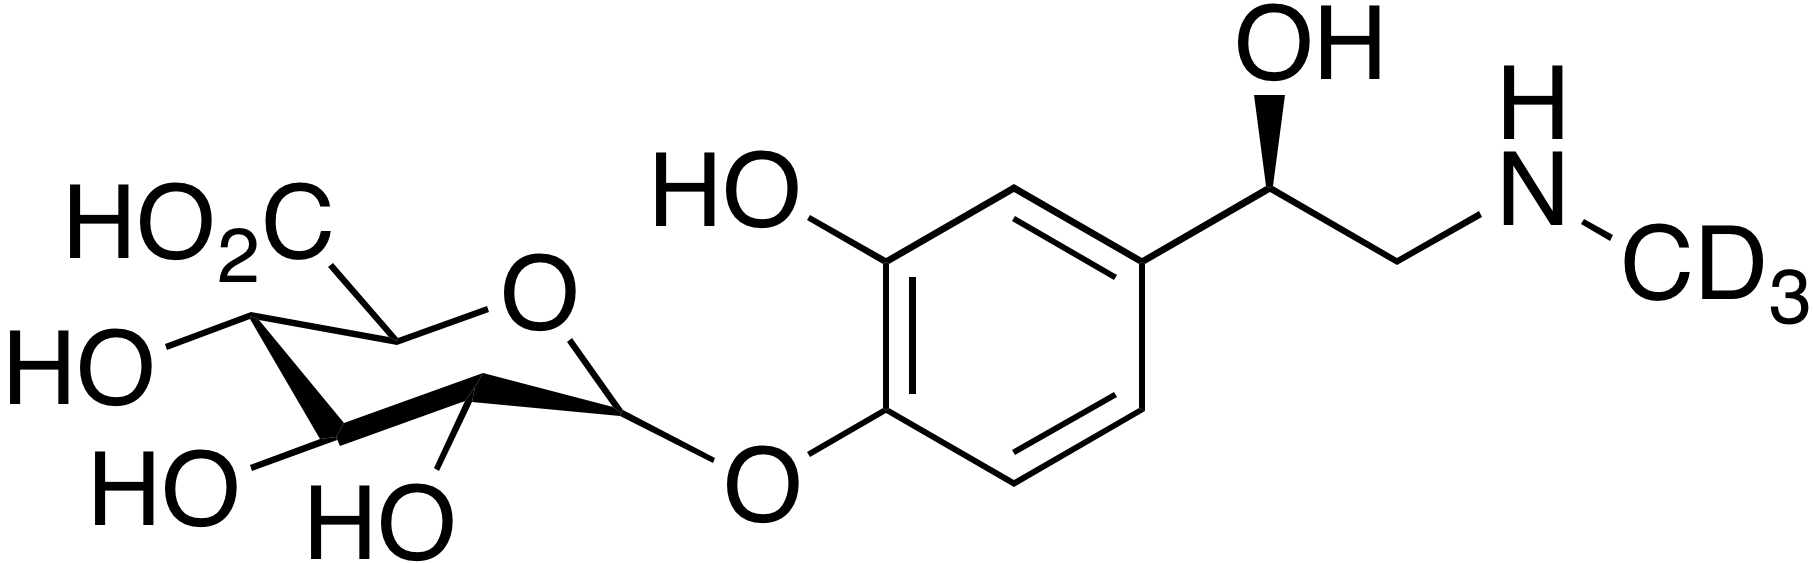 Epinephrine-d<sub>3</sub> glucuronide